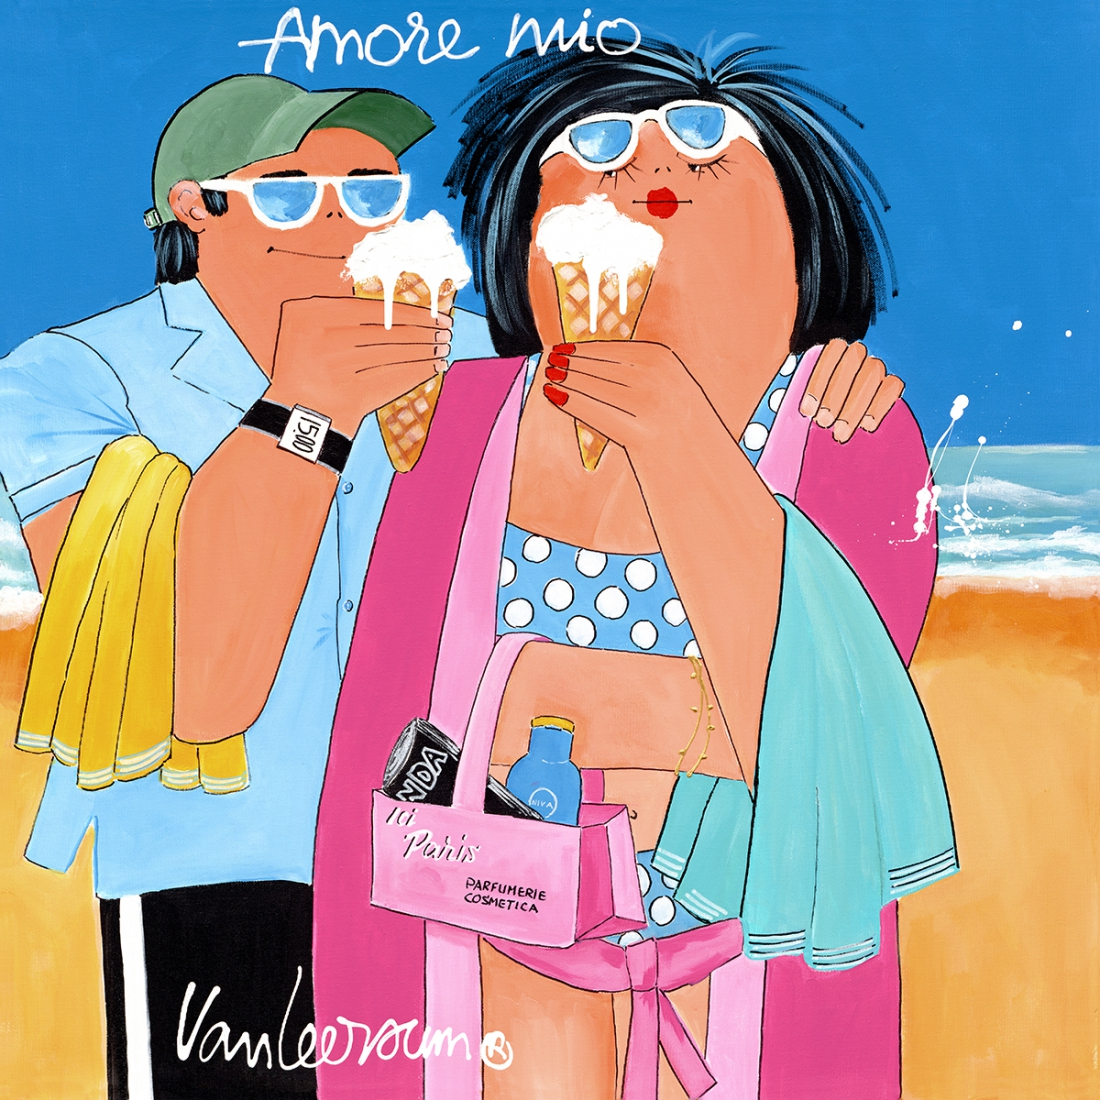 Amore Mio 70x70